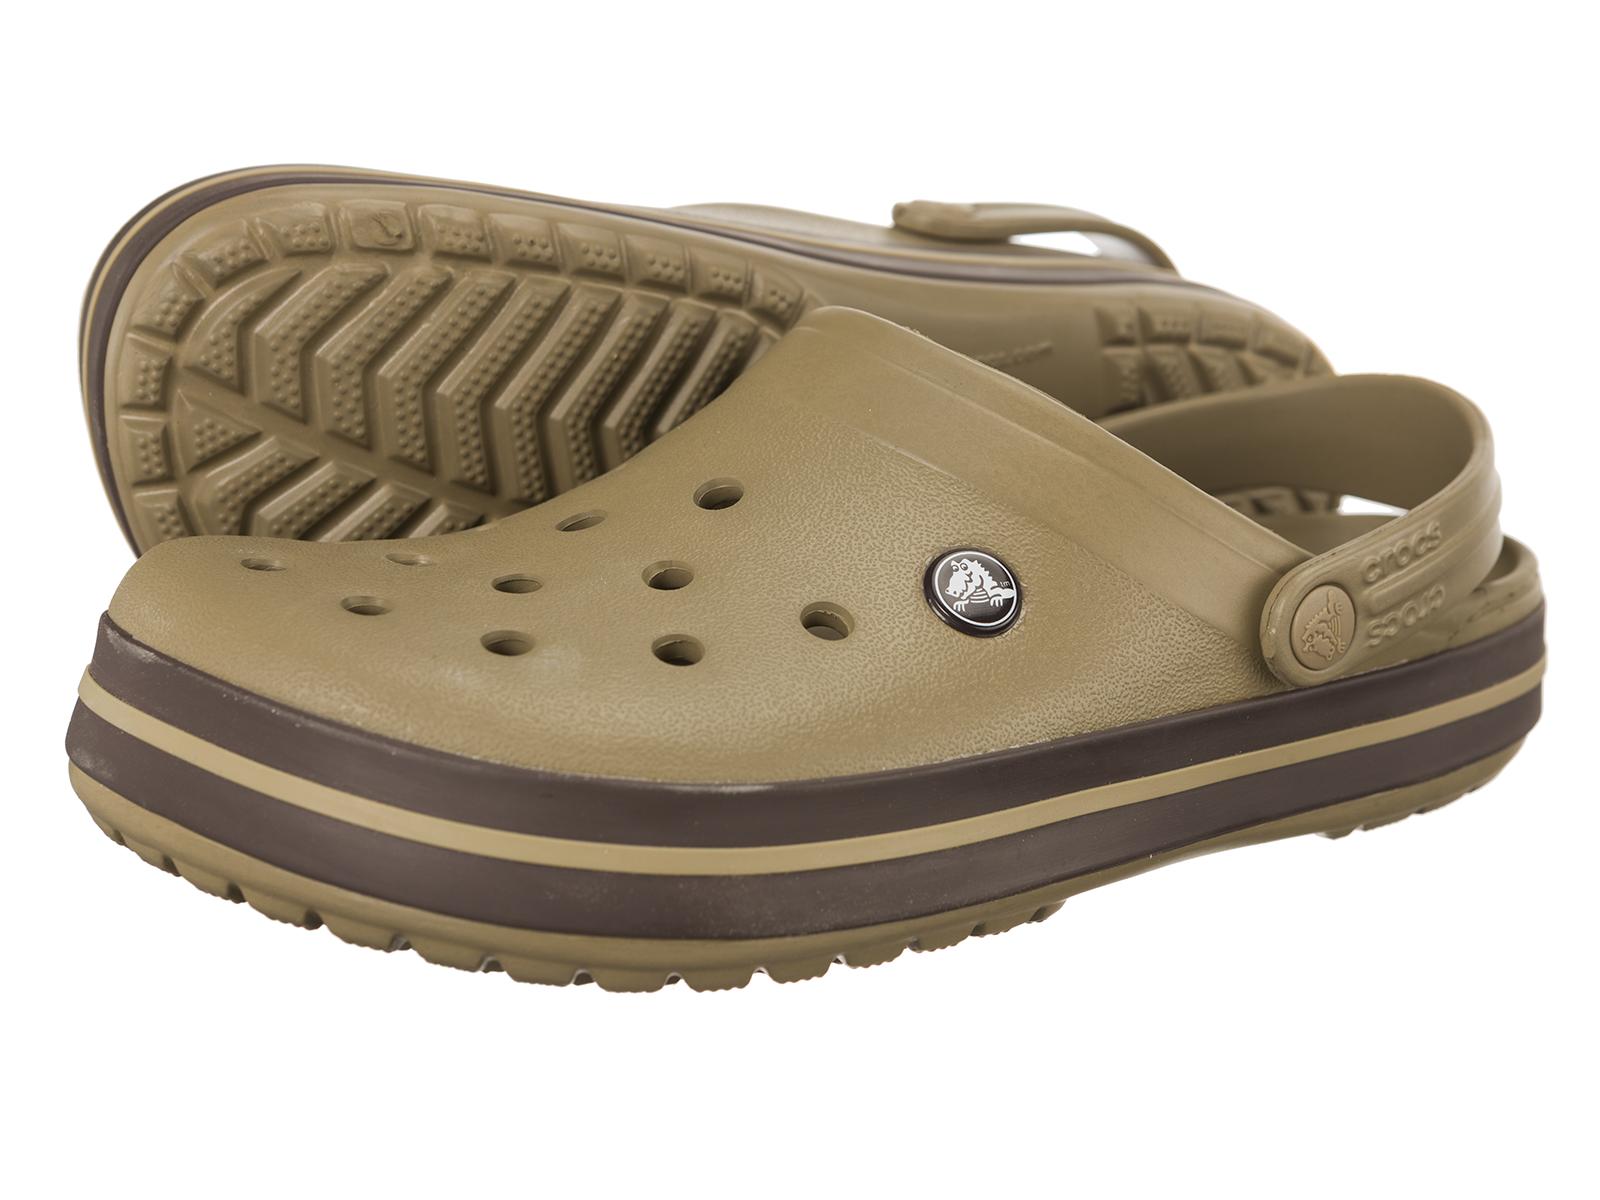 Crocs Sabots Crocband 11016 23G Mw96u